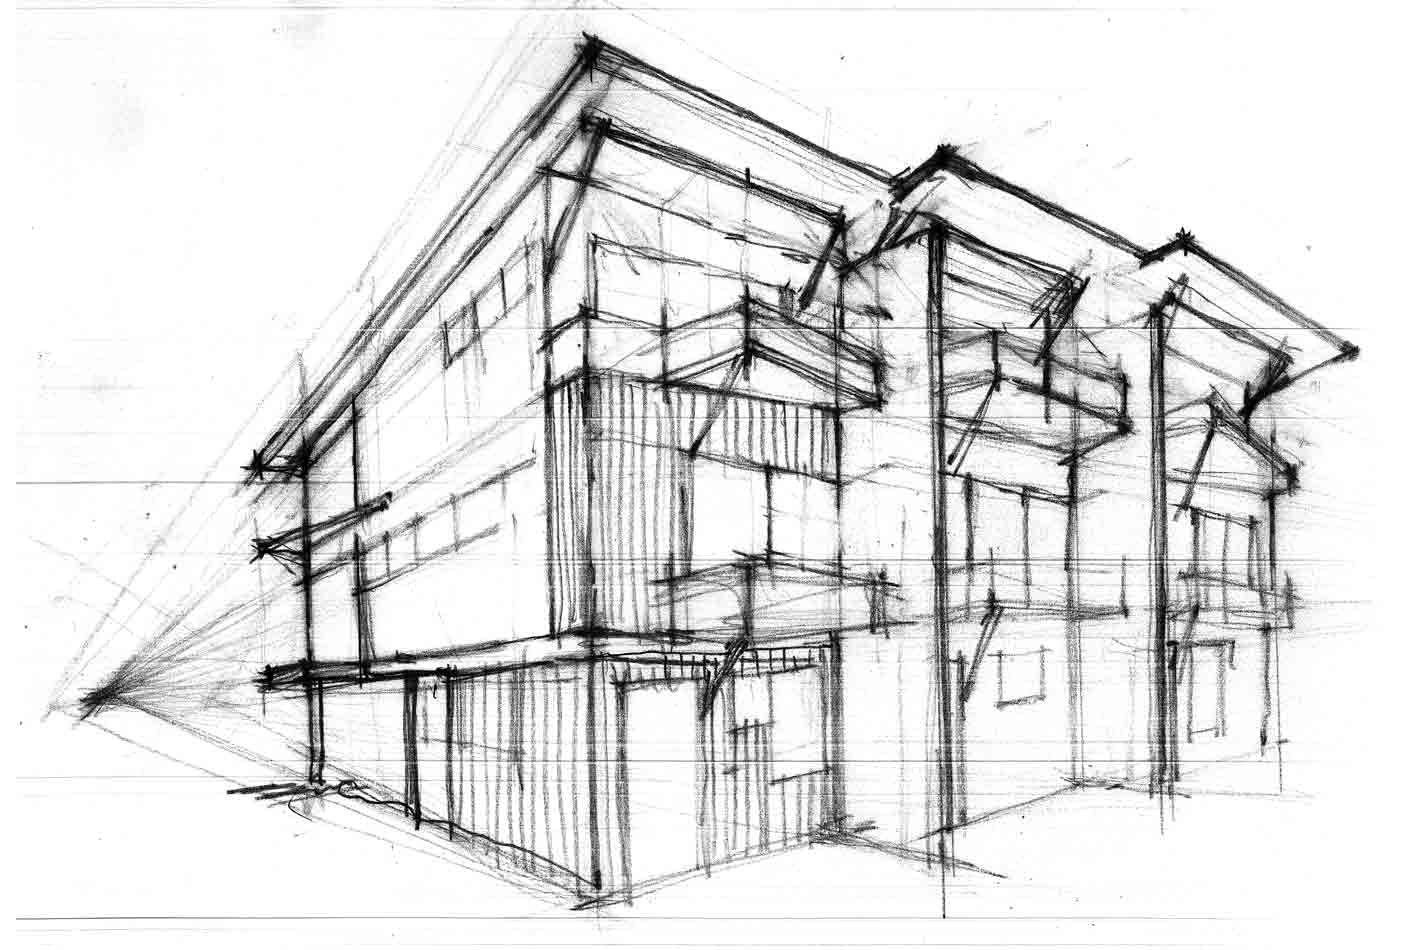 Building Sketches